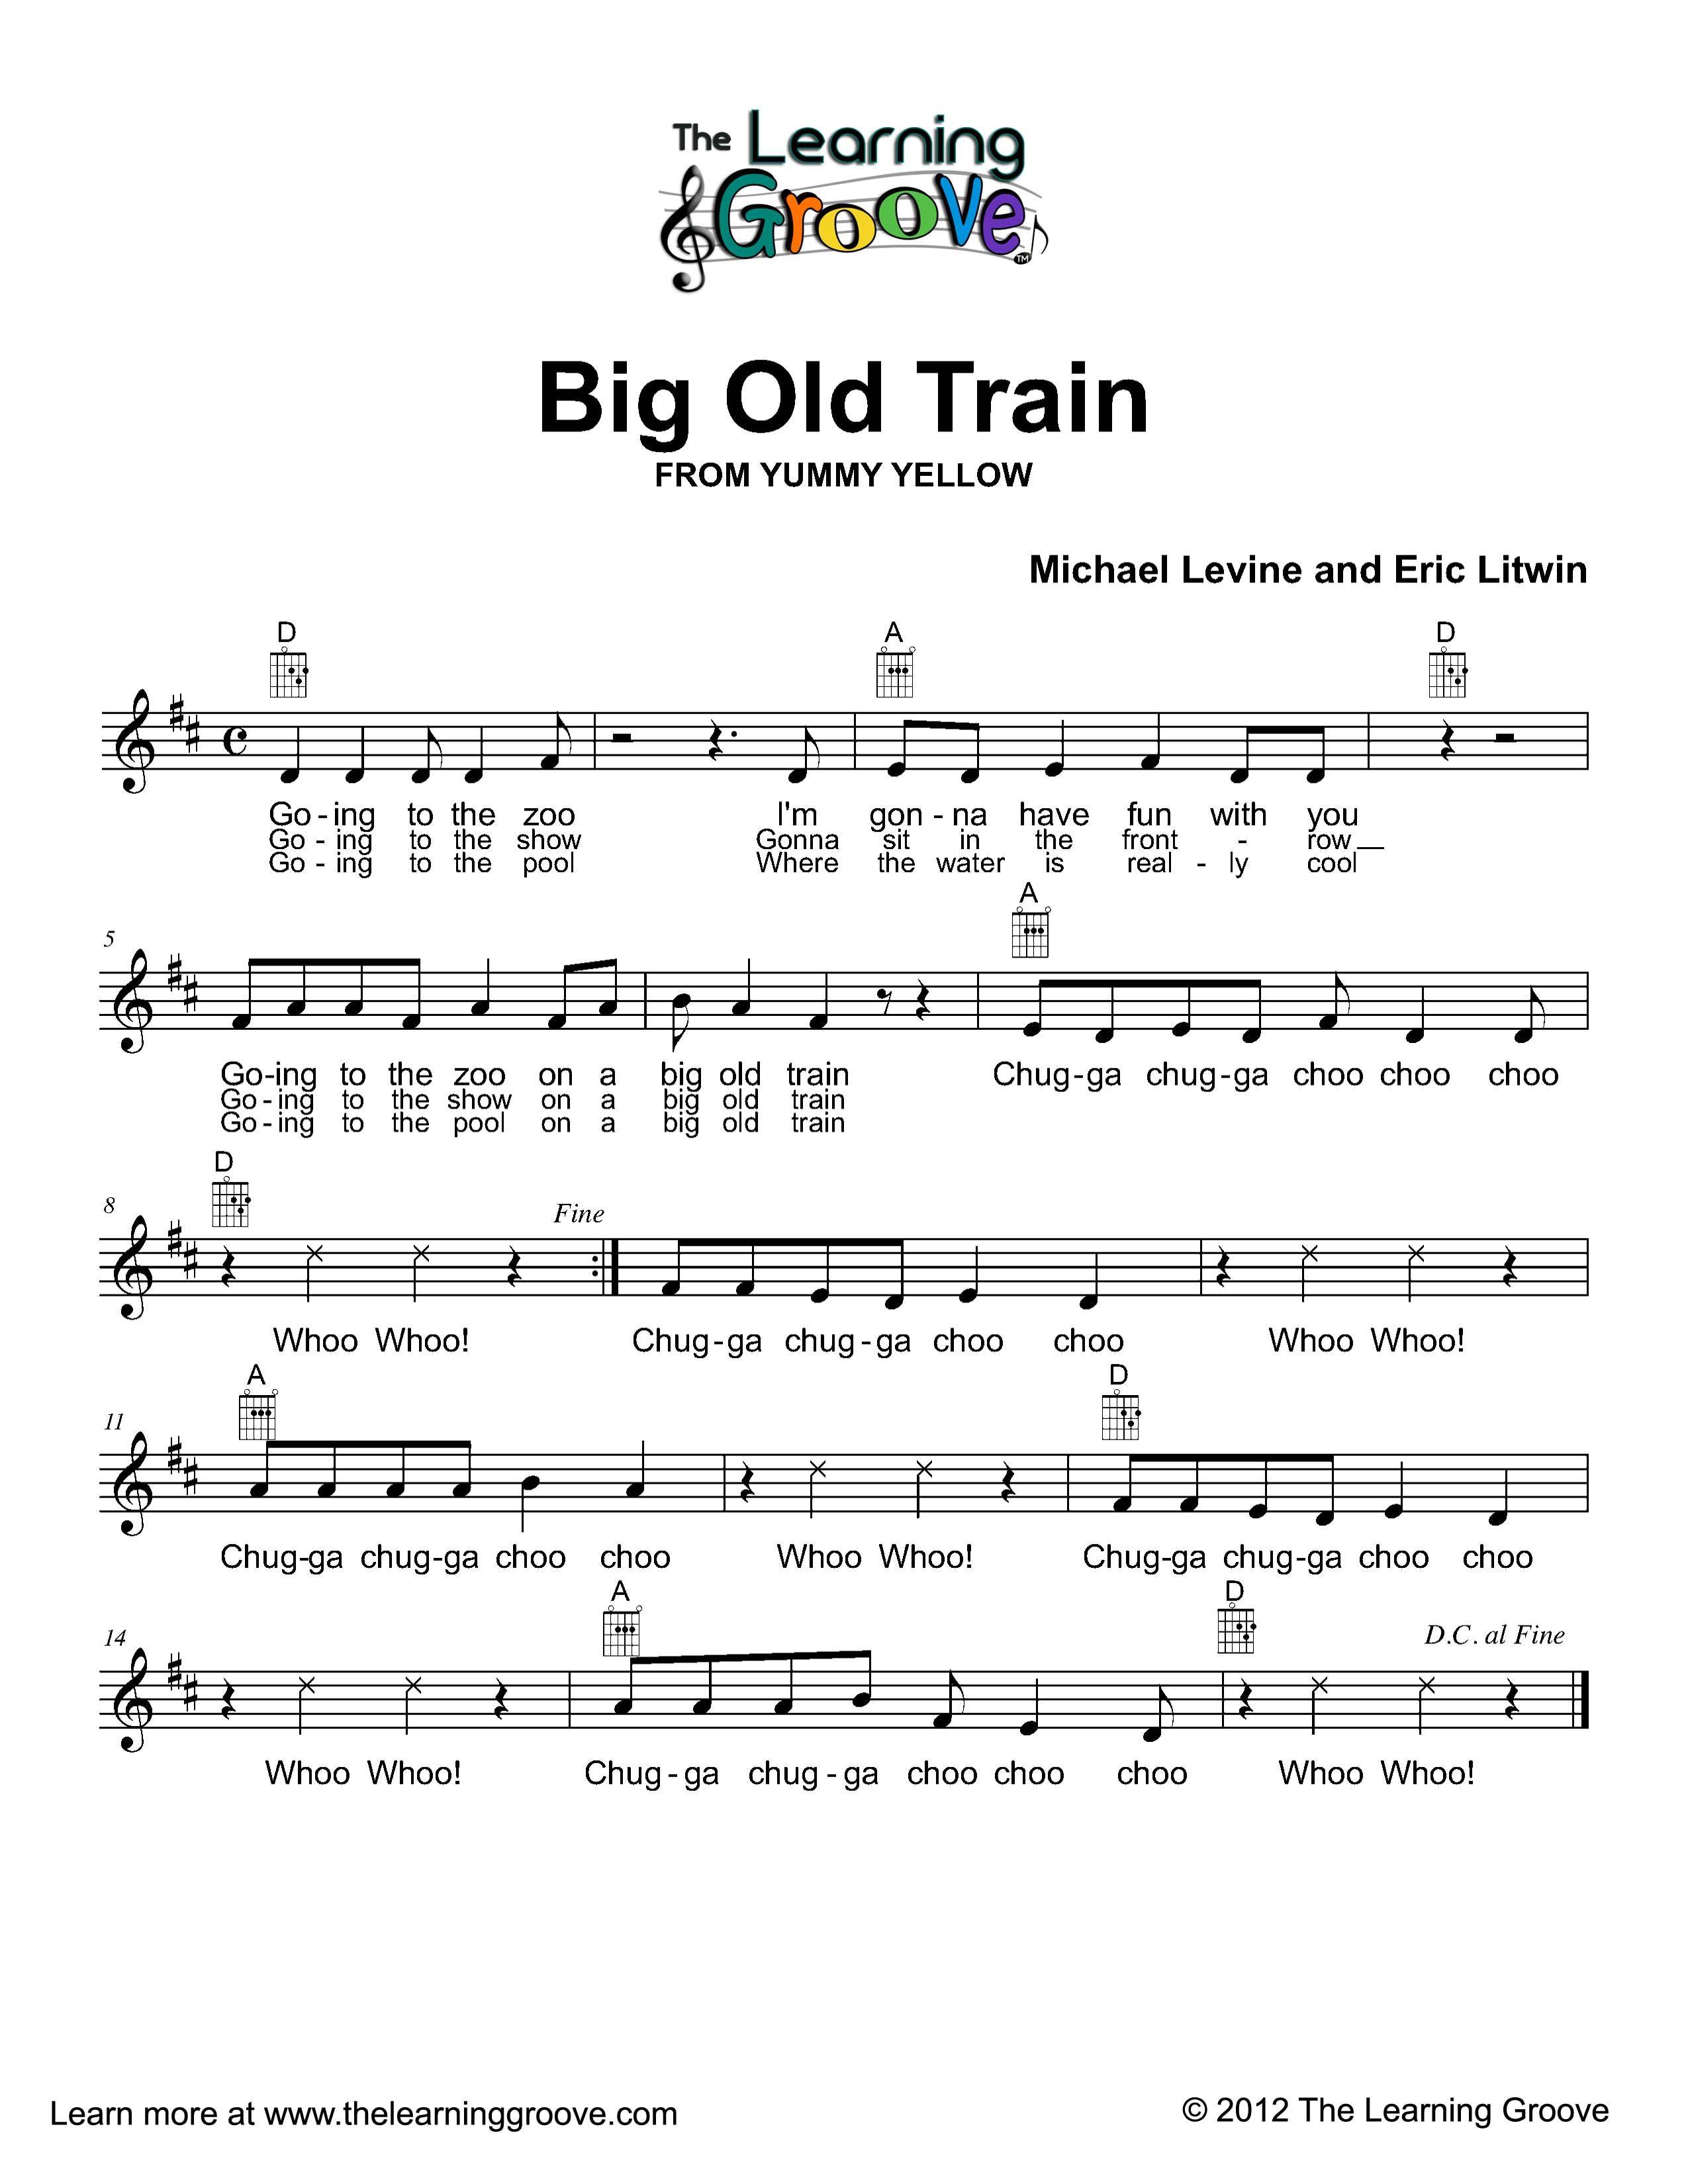 Freight Train Kids Song Lyrics